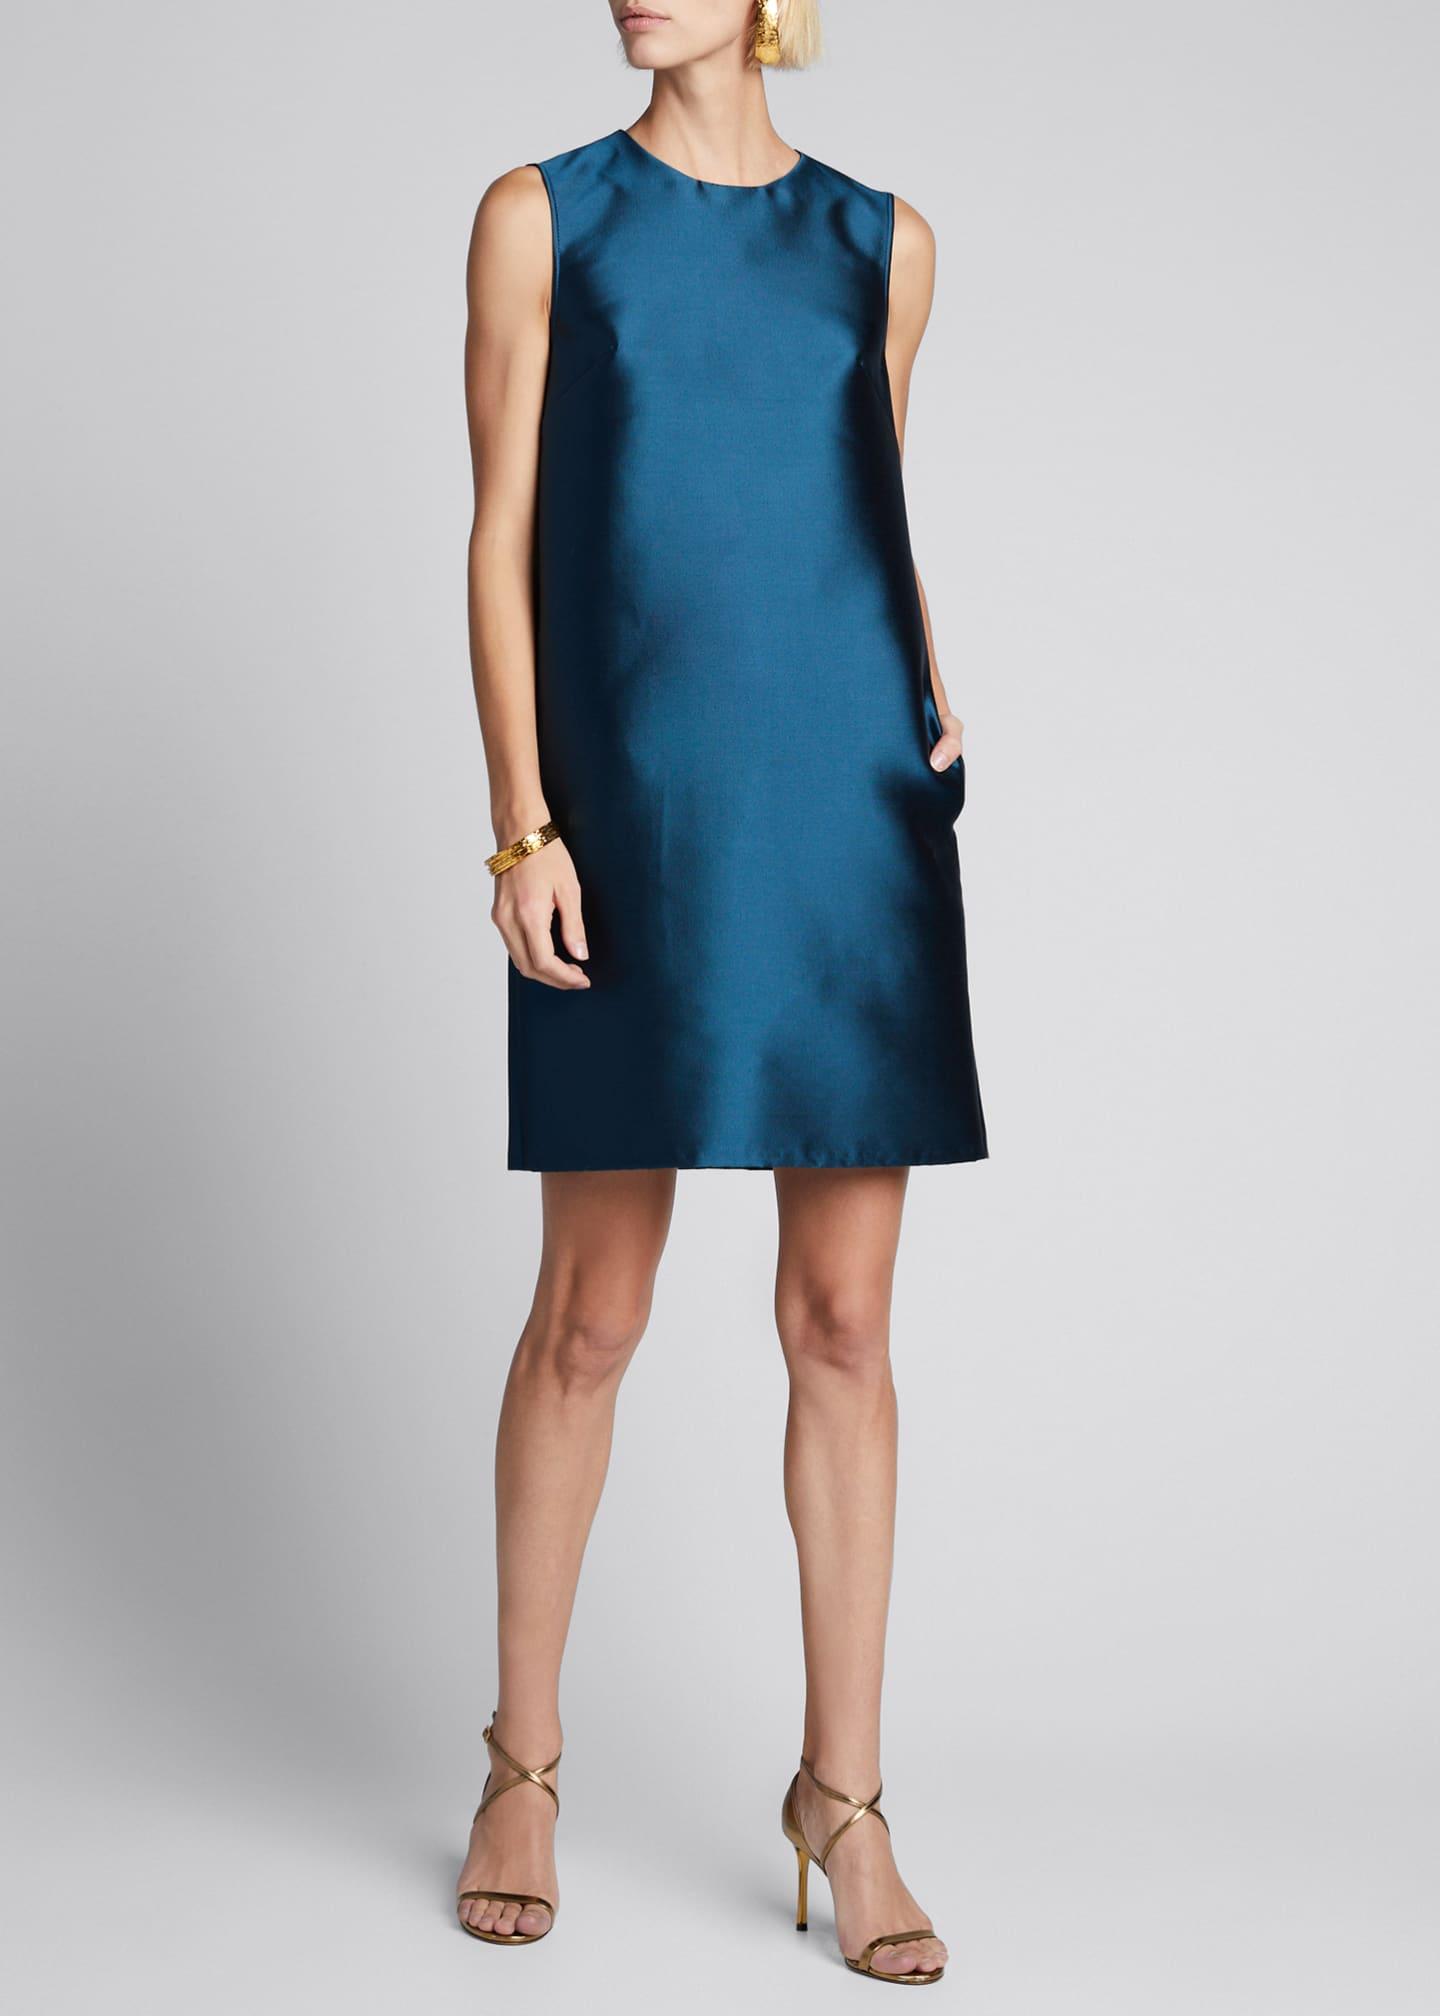 Carolina Herrera Silk Gazar Sleeveless Shift Dress